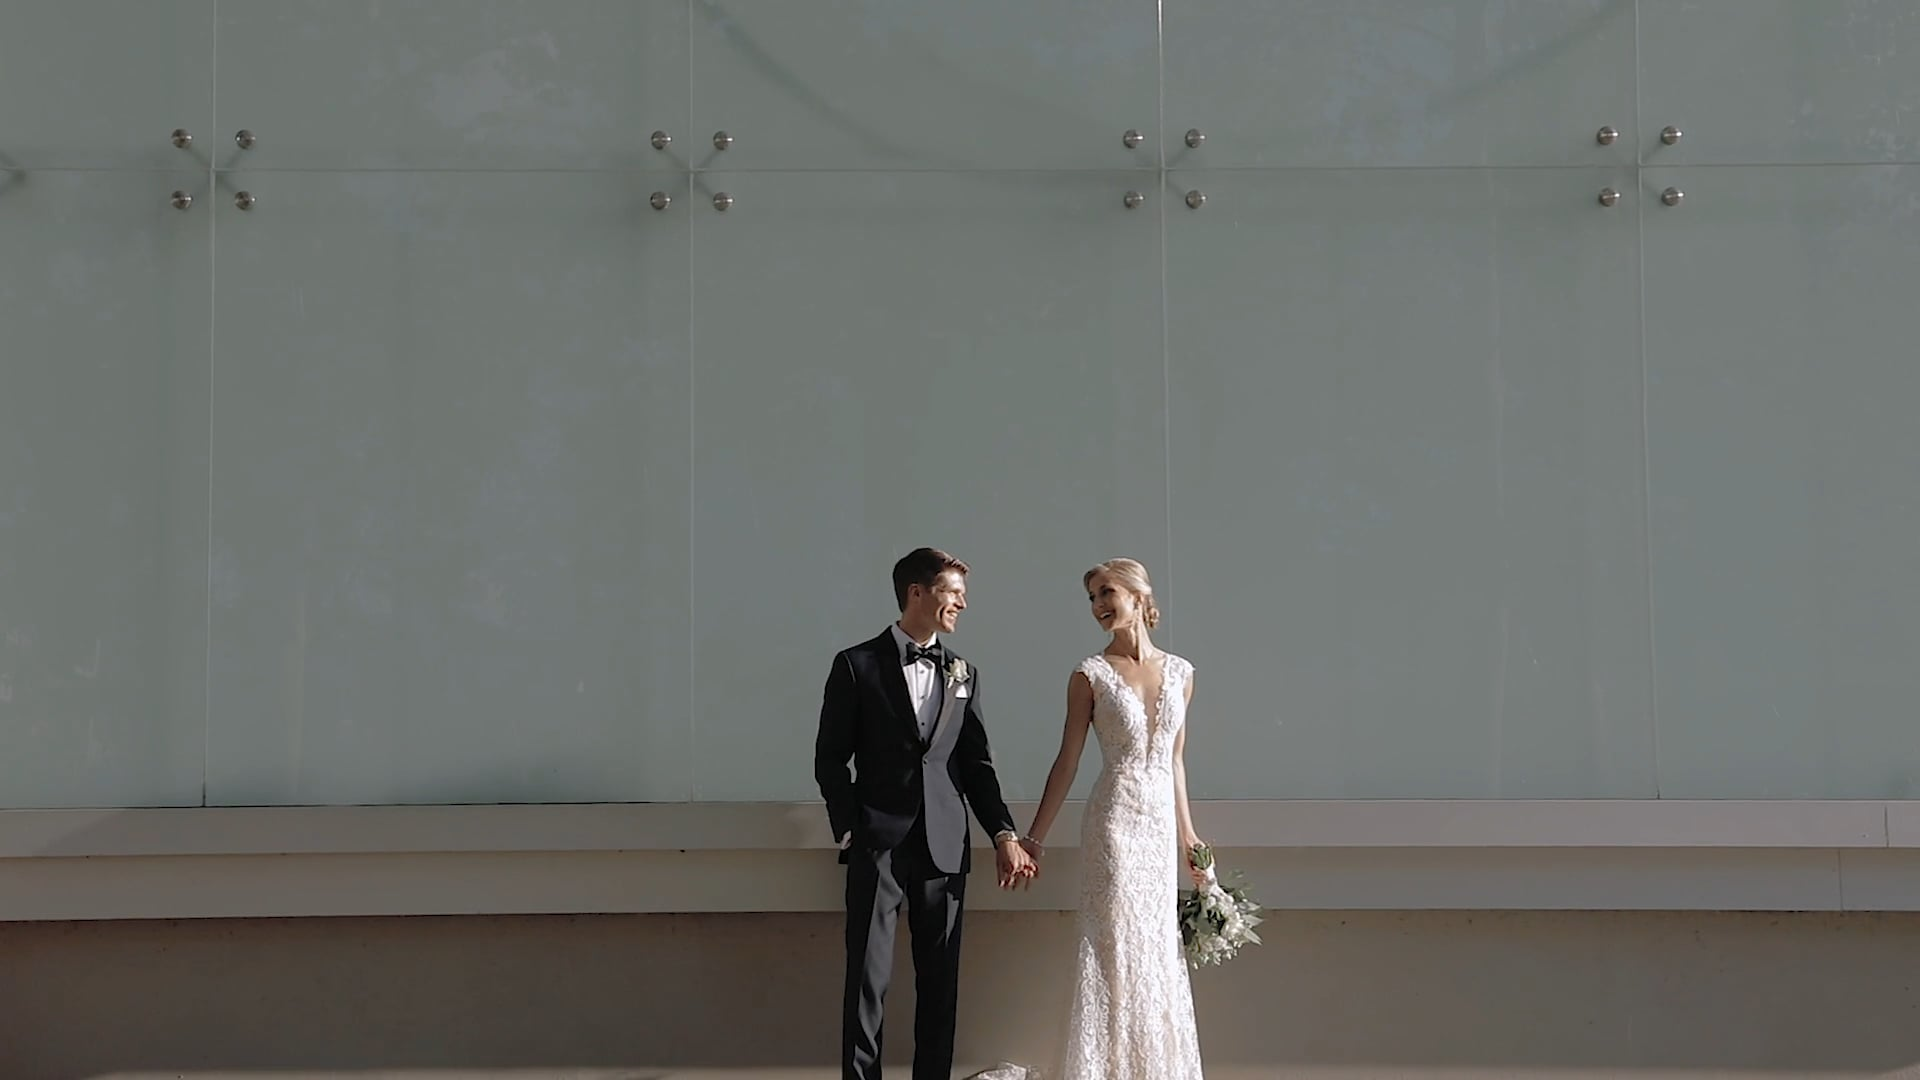 Candace + Chris // Wedding Teaser